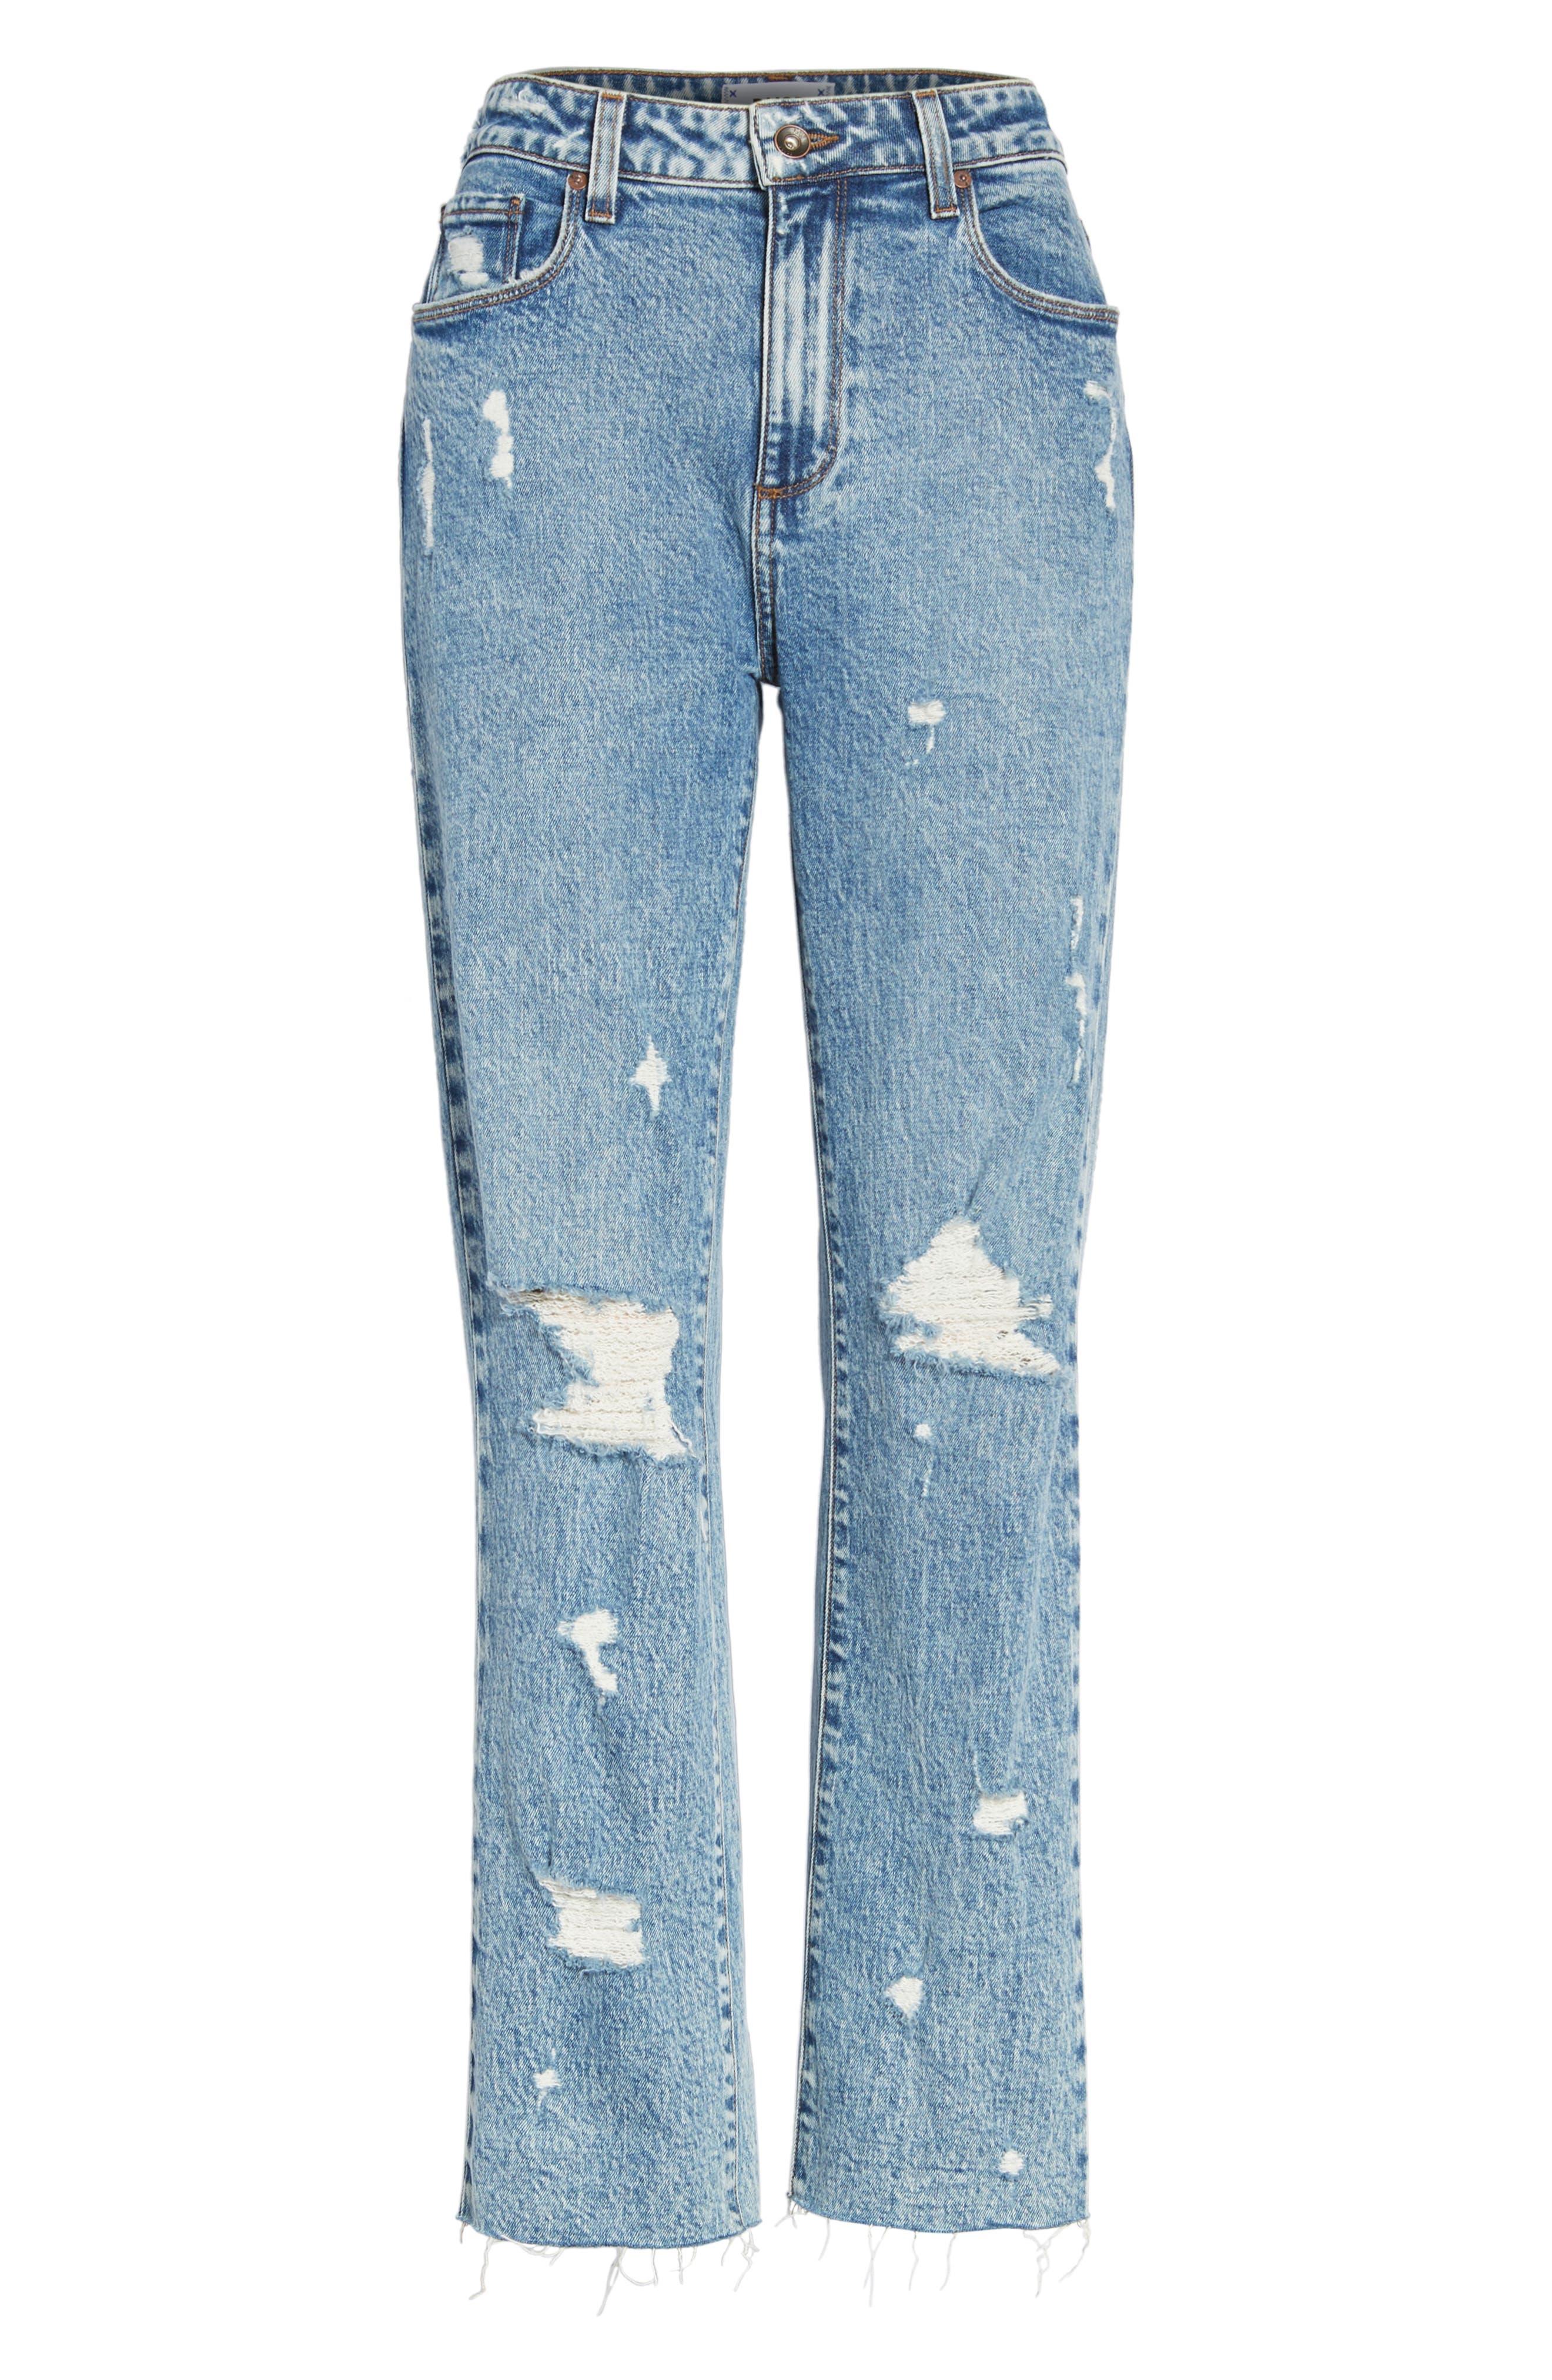 Noella Straight Leg Crop Jeans,                             Alternate thumbnail 7, color,                             Westlyn Destructed